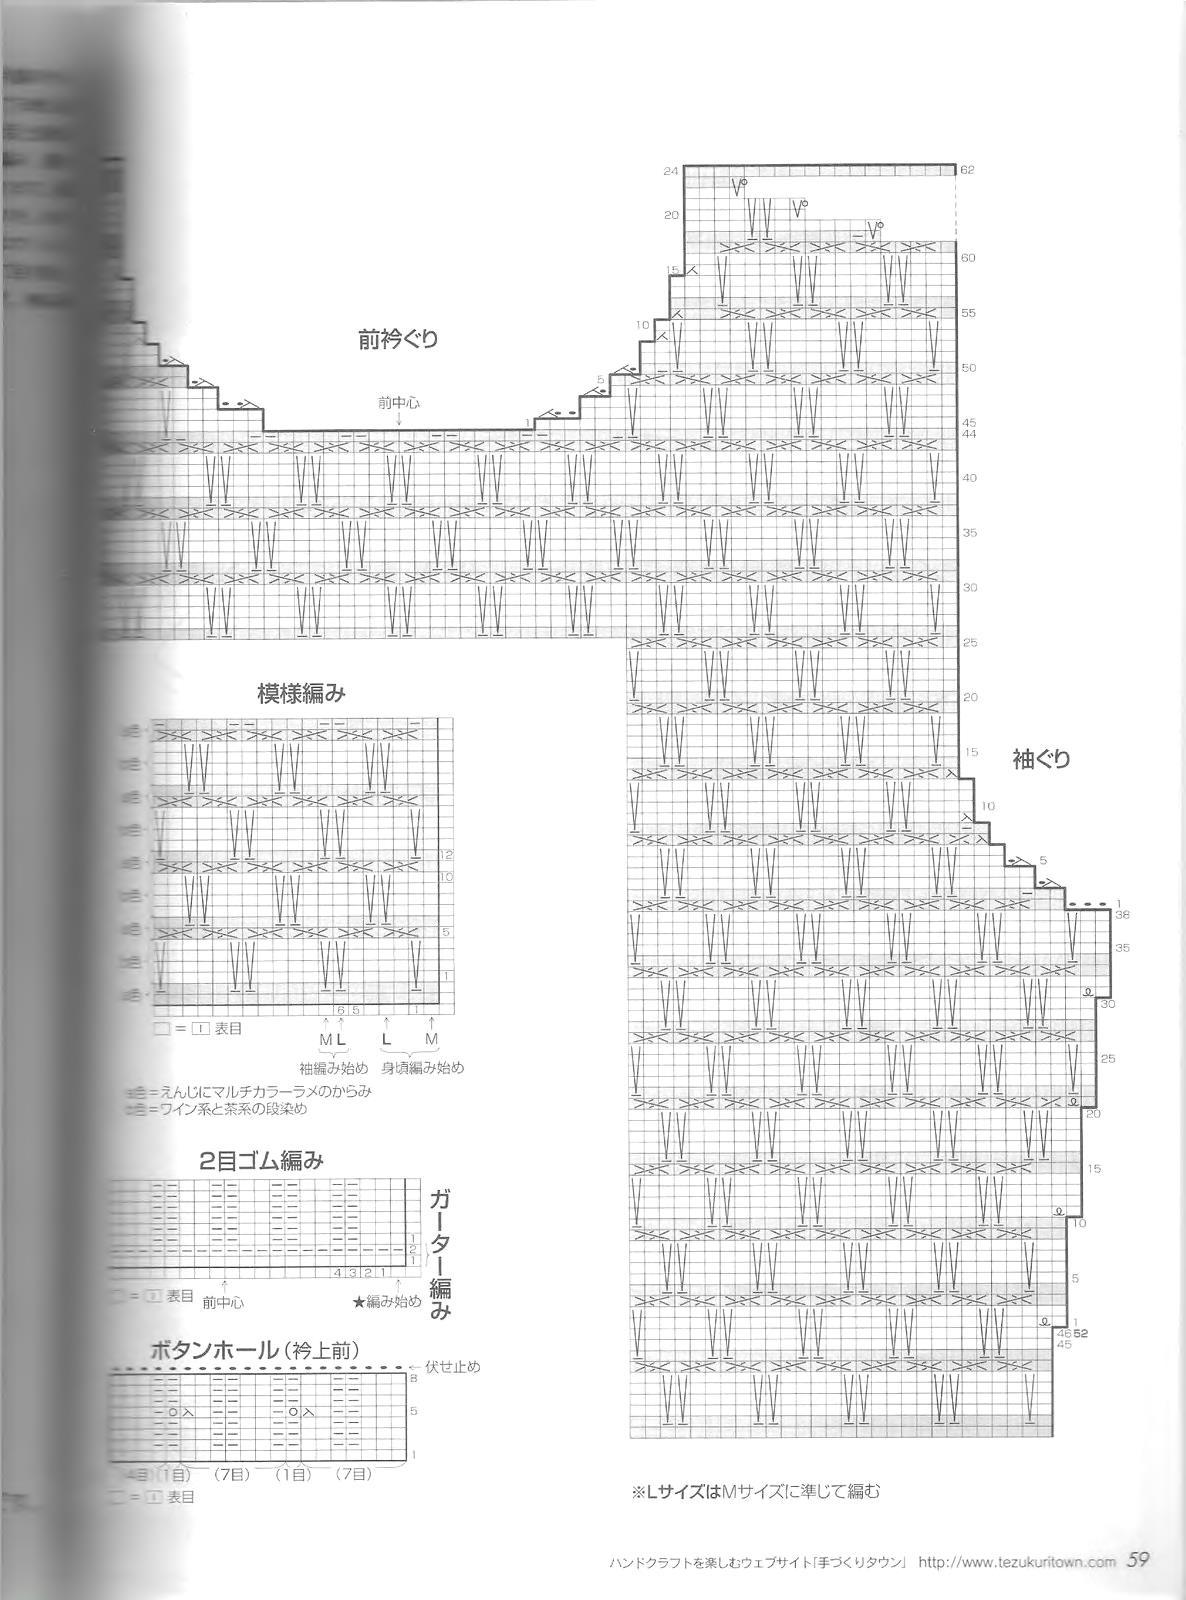 Let's knit series NV4375 2008 M-L sp-kr_59